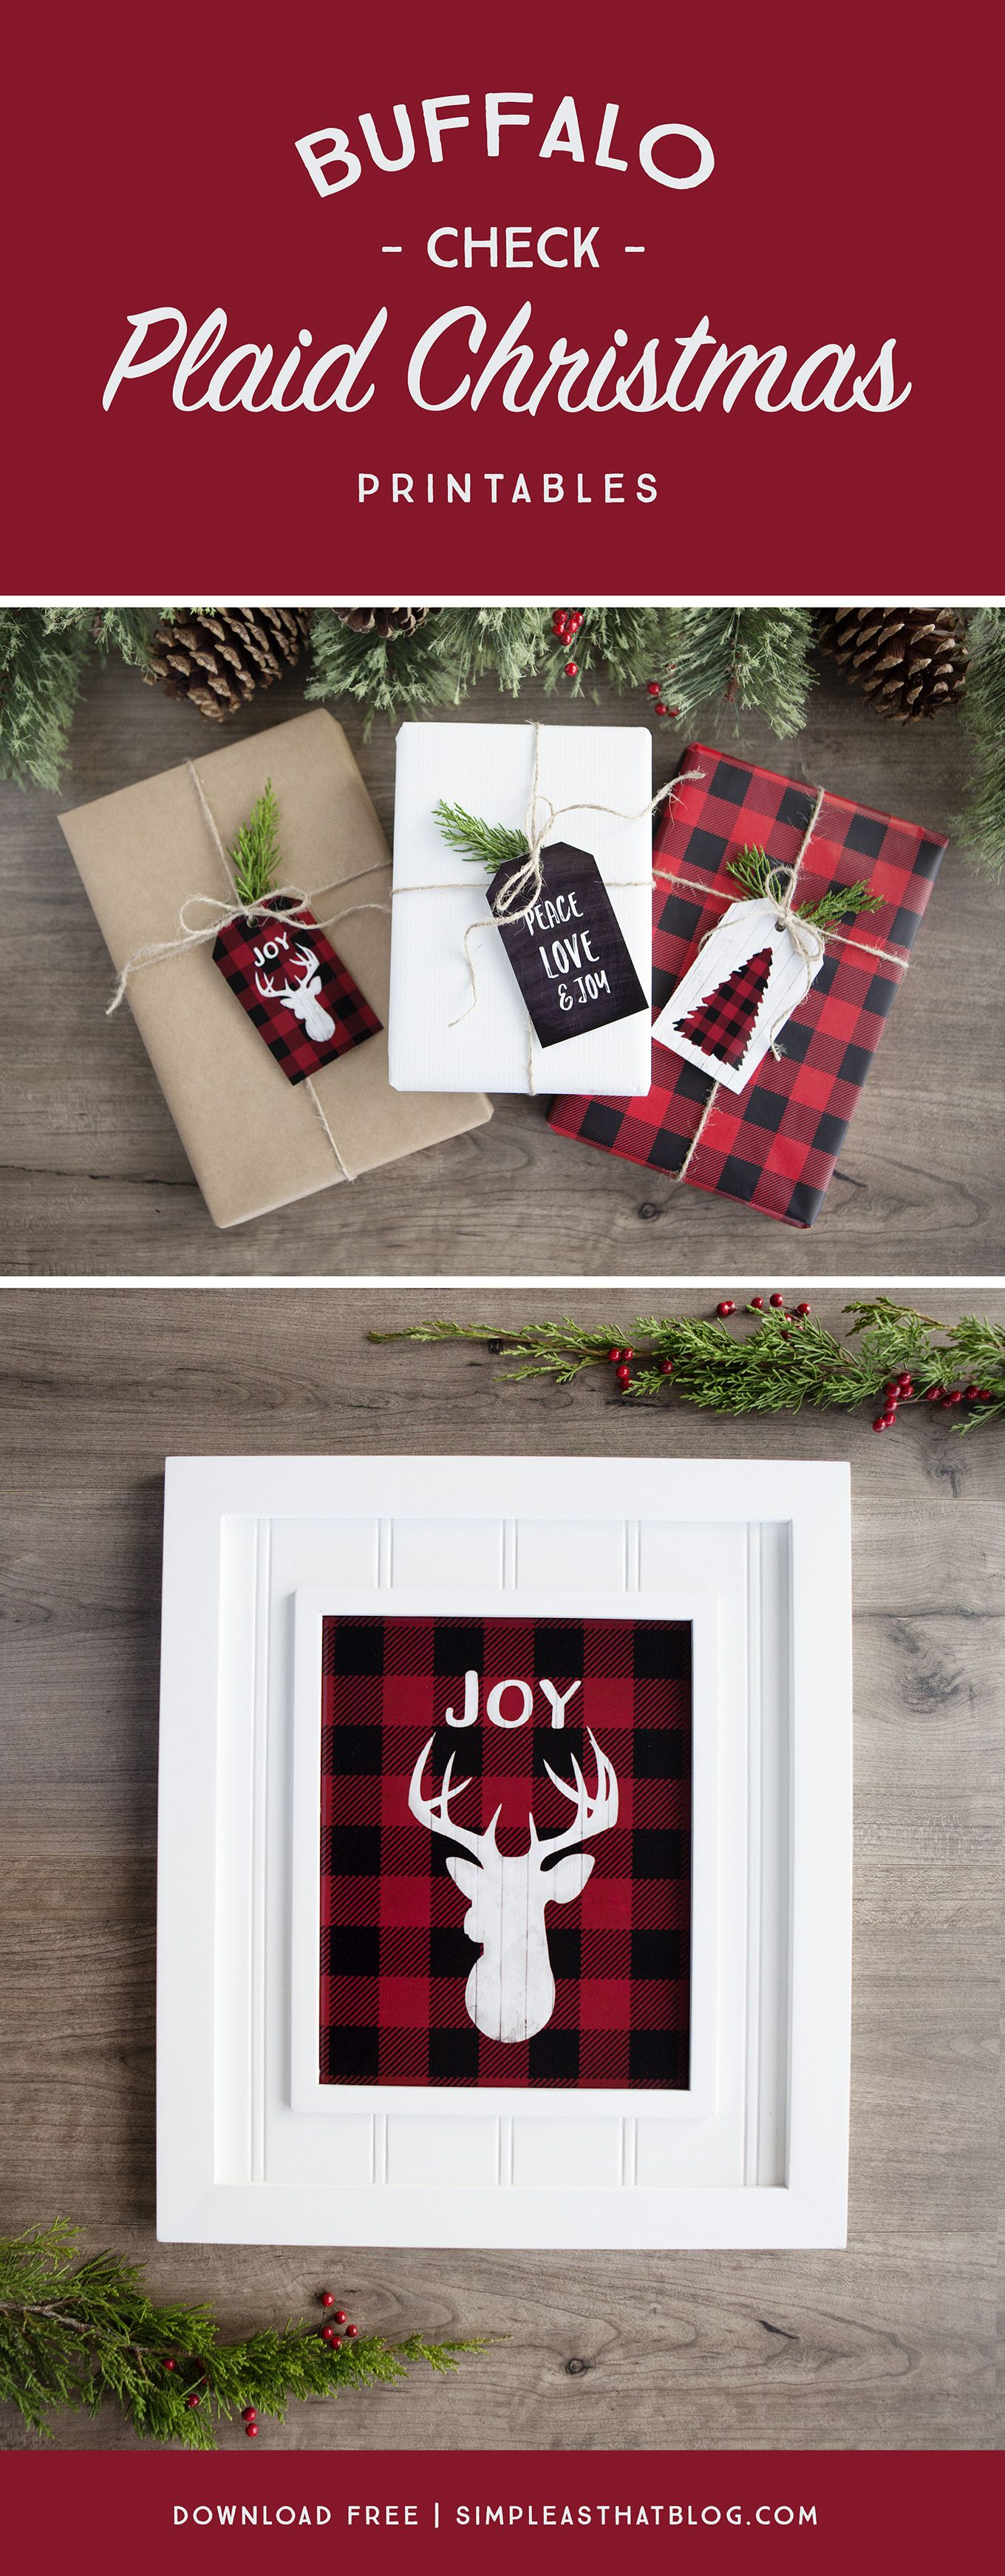 Free Buffalo Check Plaid Christmas Printables Pinterest